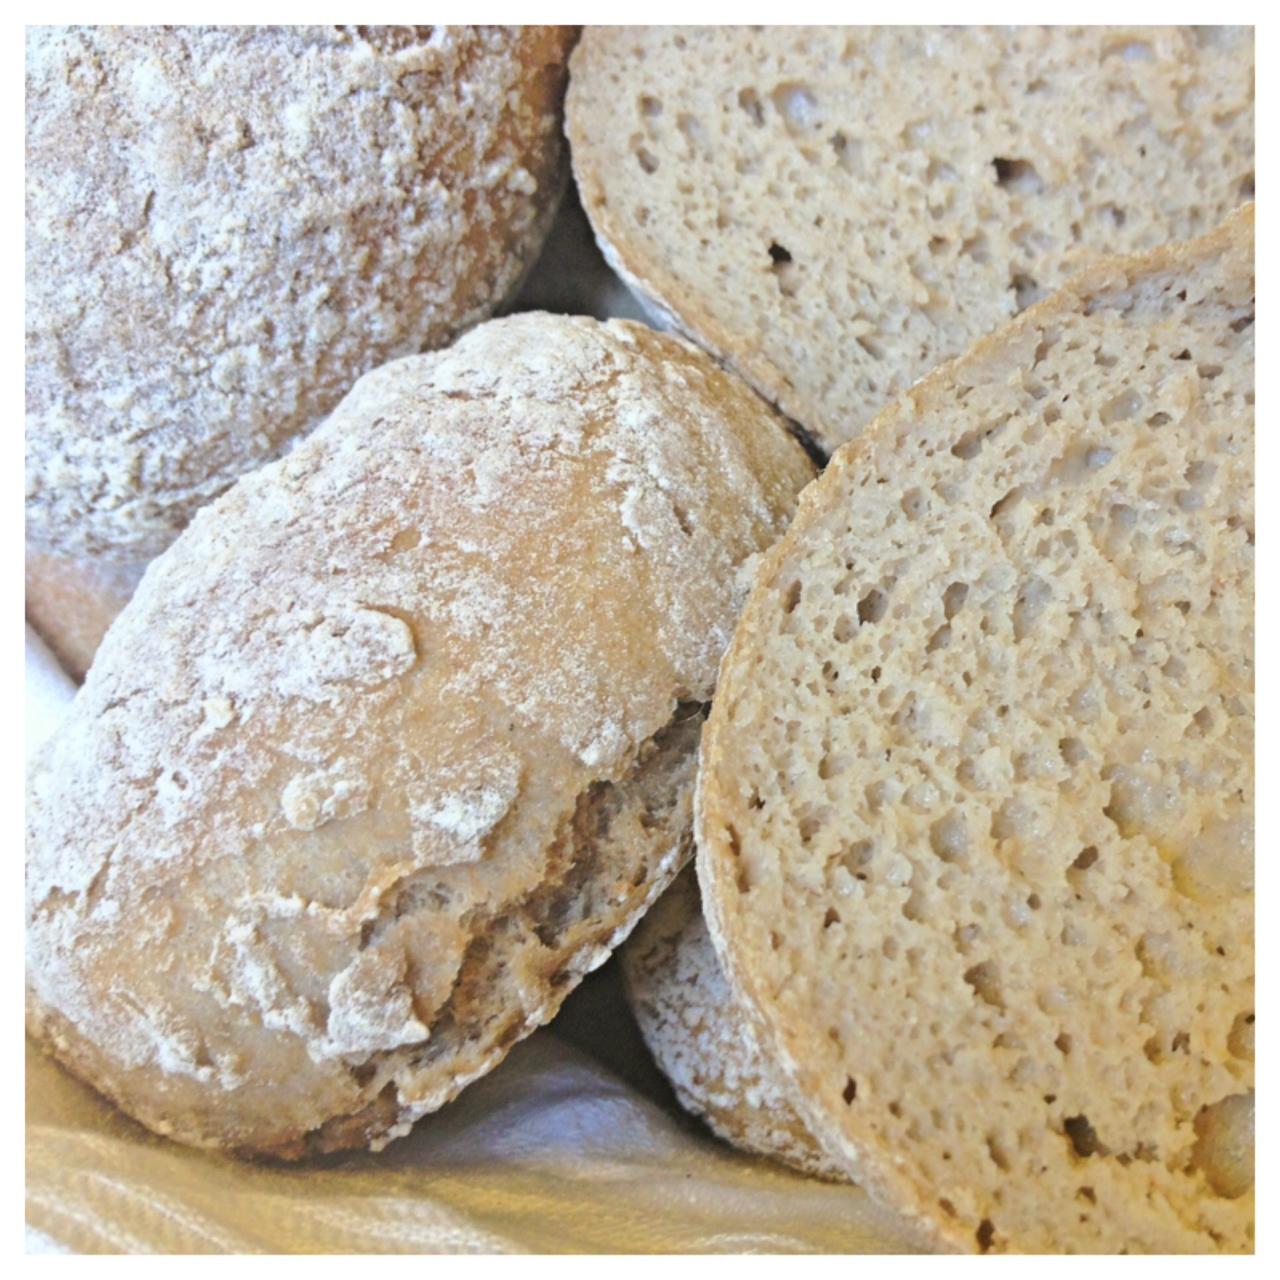 vegansk glutenfritt bröd